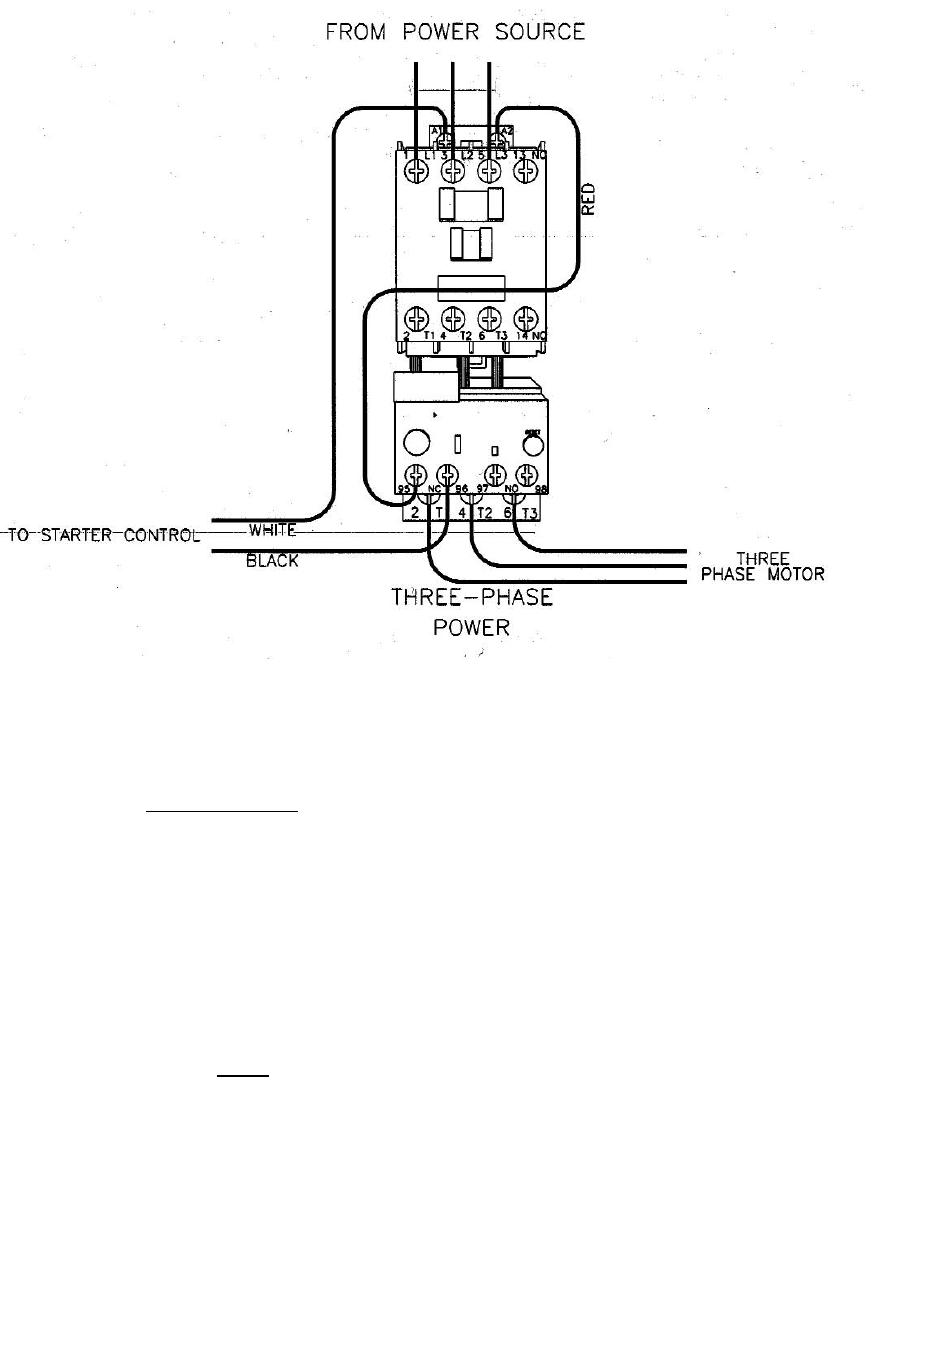 Ge Appliances E4 Users Manual OSMONICS E4, E4LE, EZ4 SERIES